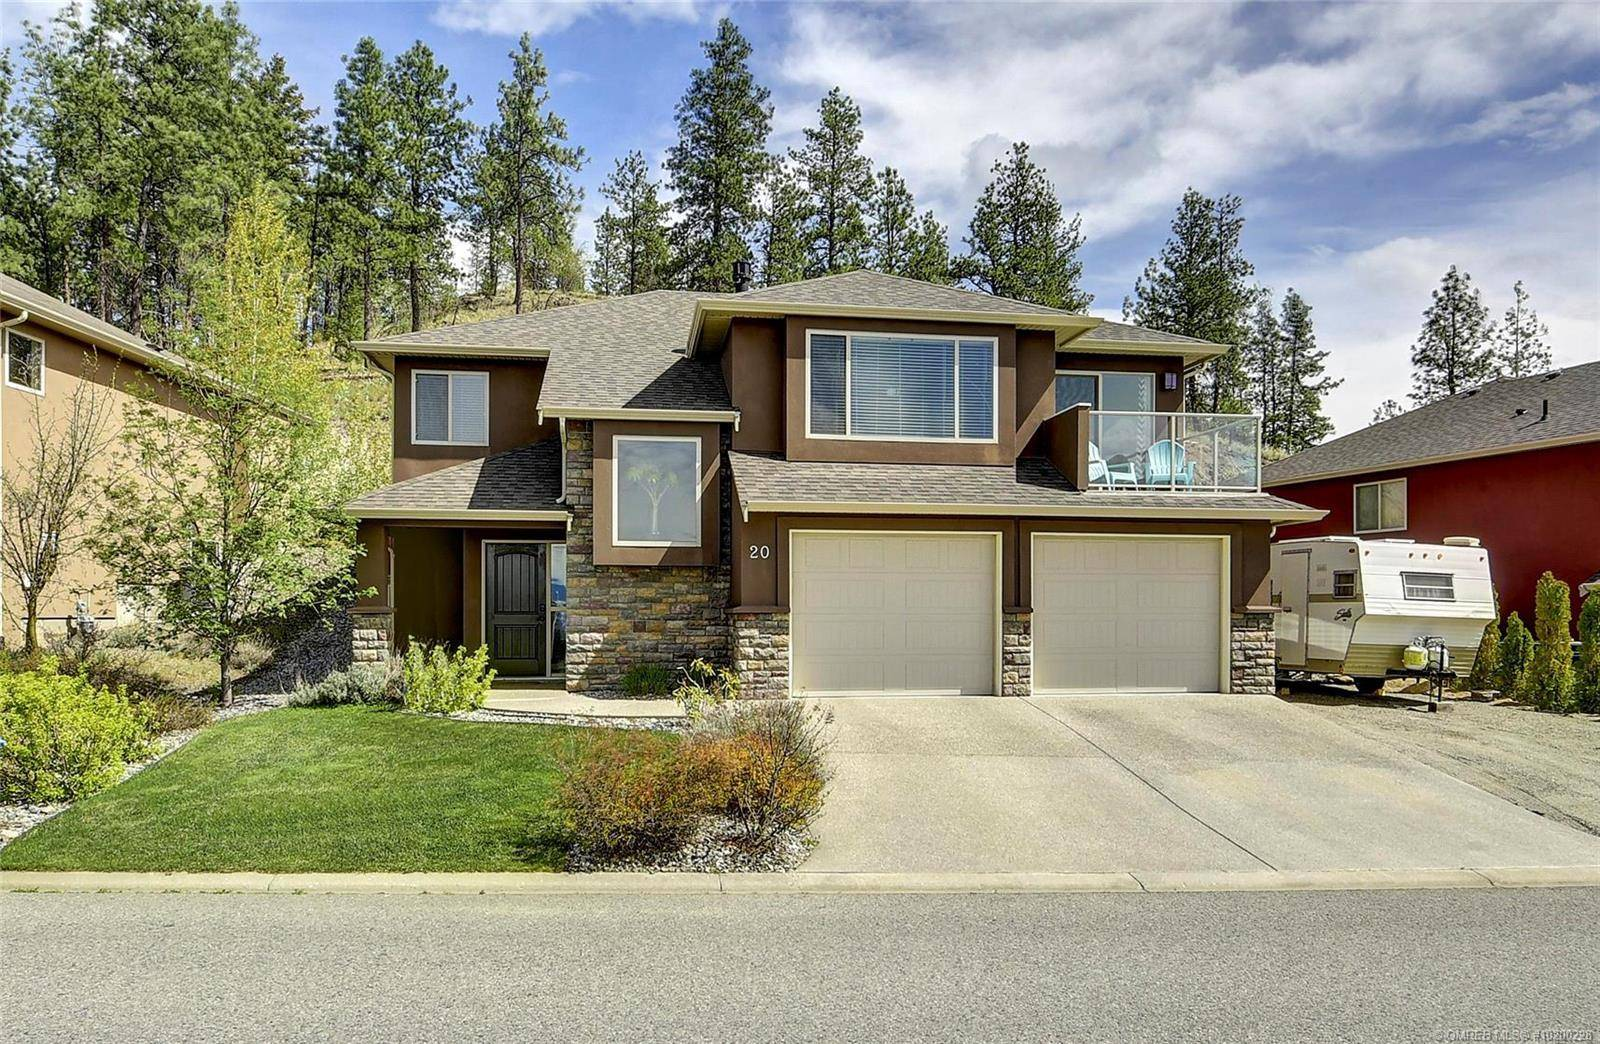 House for sale at 2040 Rosealee Ln Unit 20 West Kelowna British Columbia - MLS: 10200228